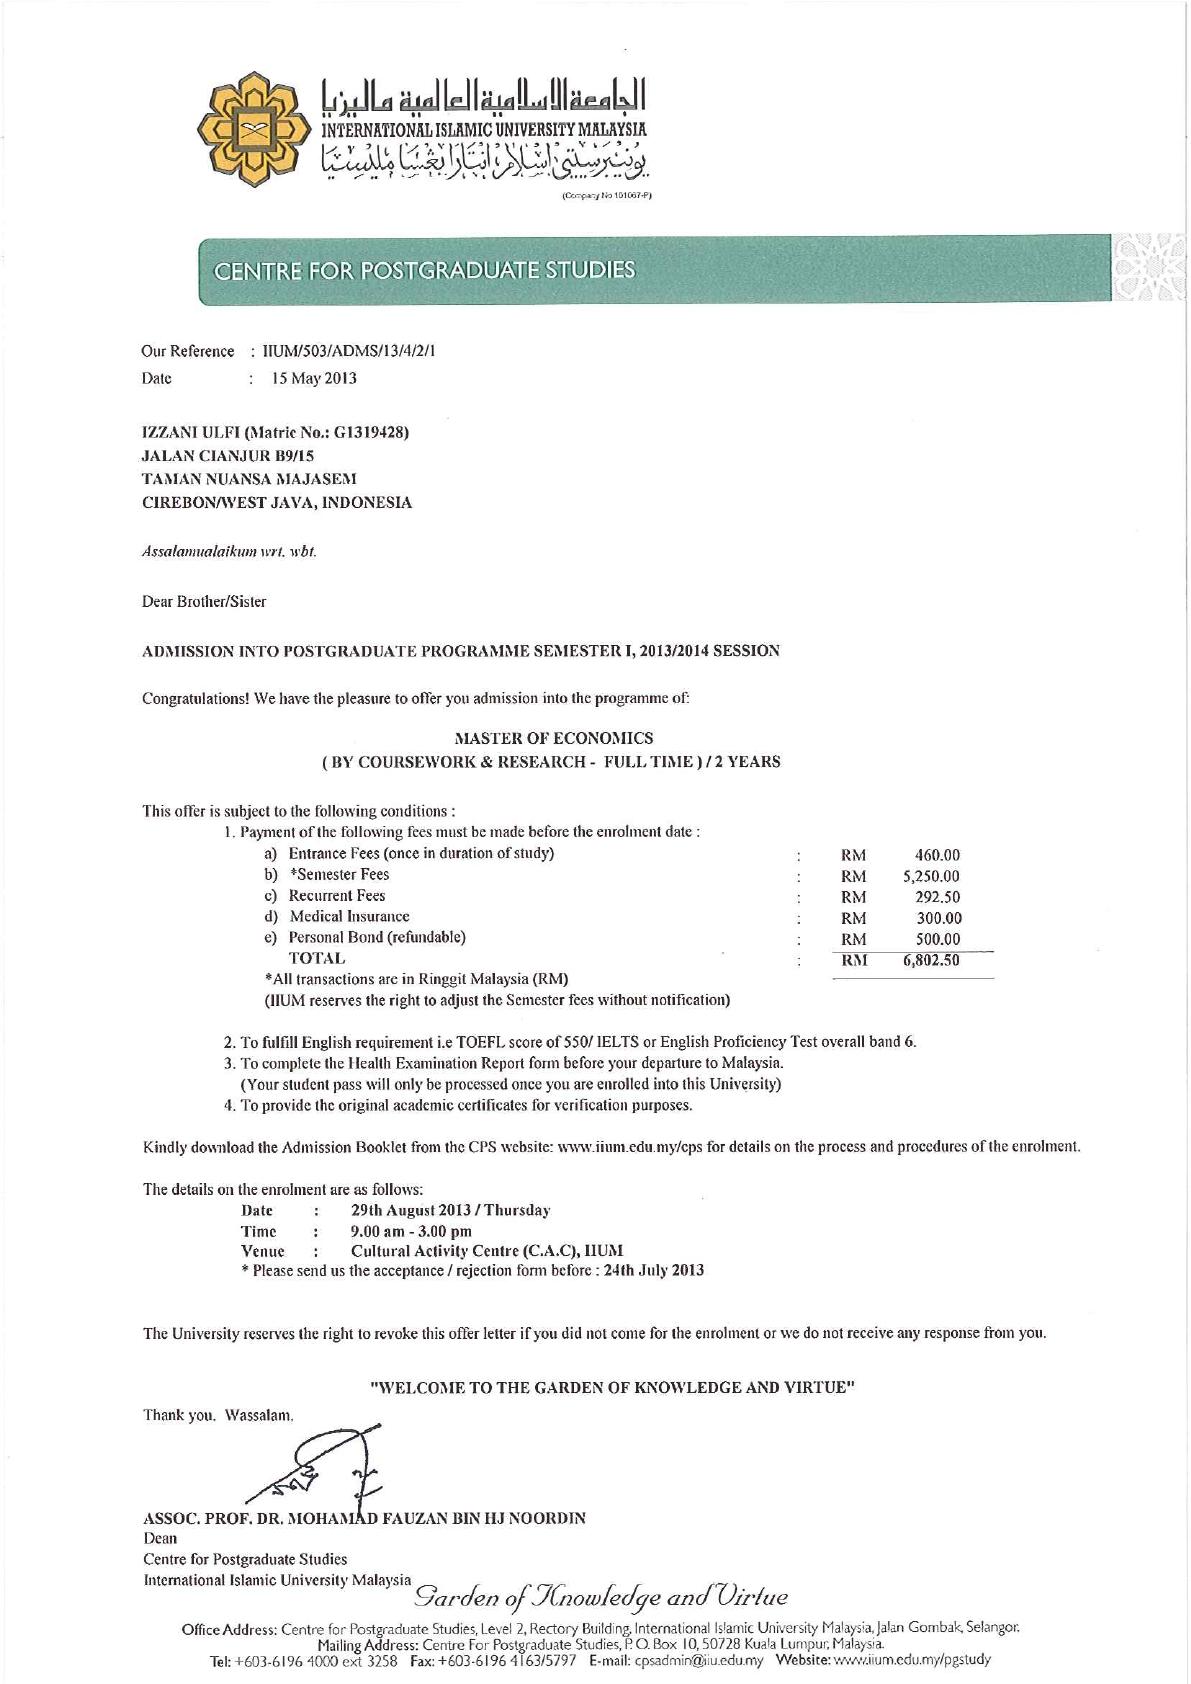 Offer Letter Changed G